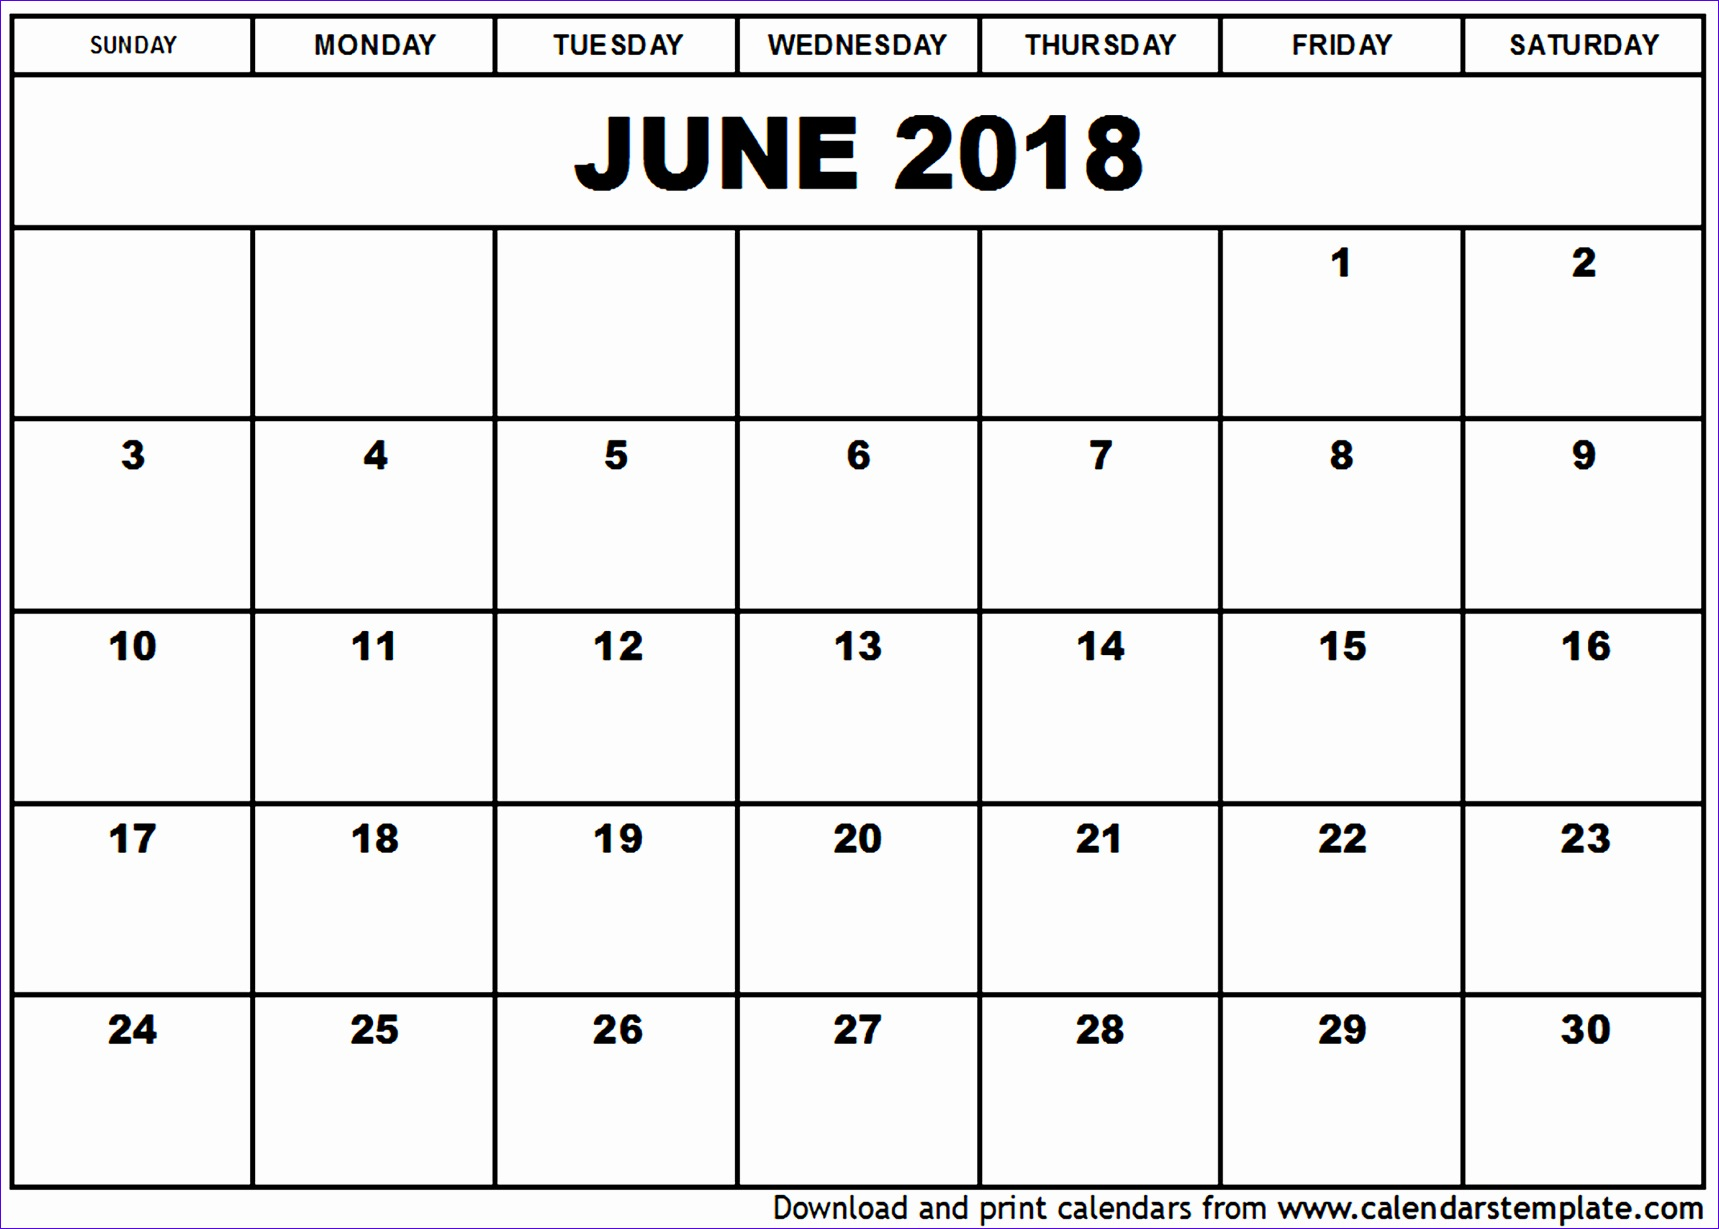 june 2018 calendar template 830